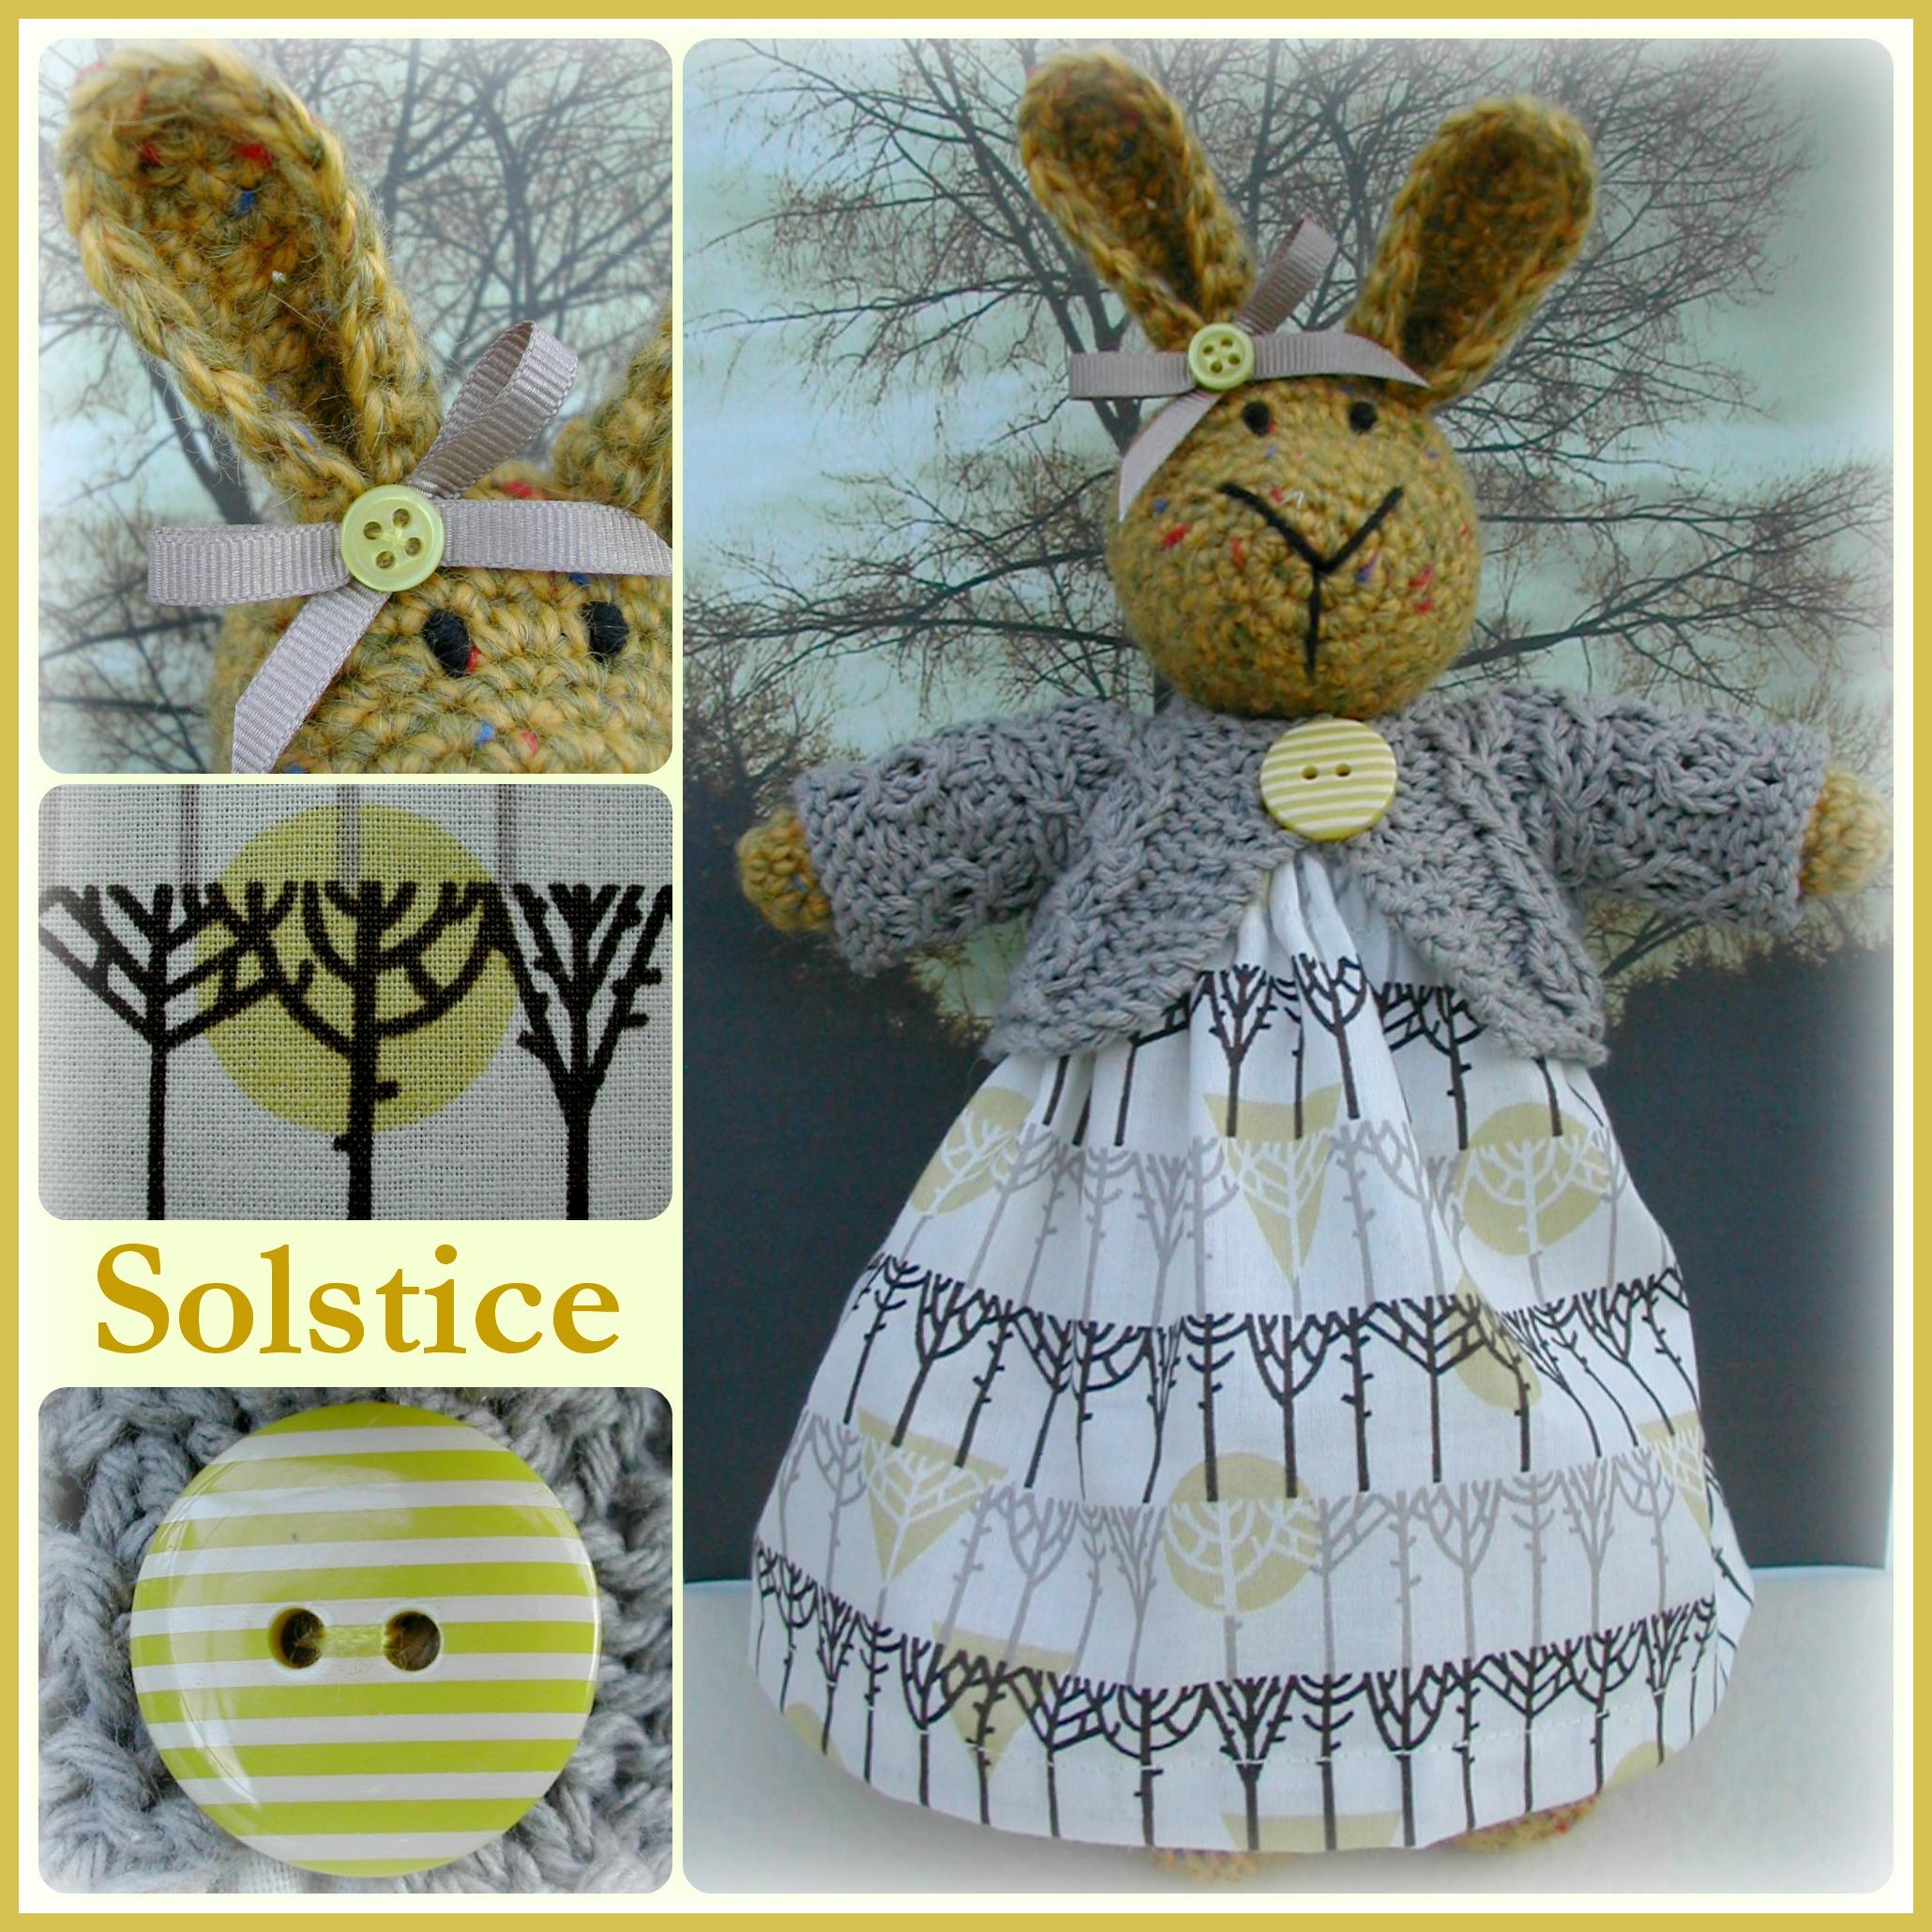 Solstice Collage